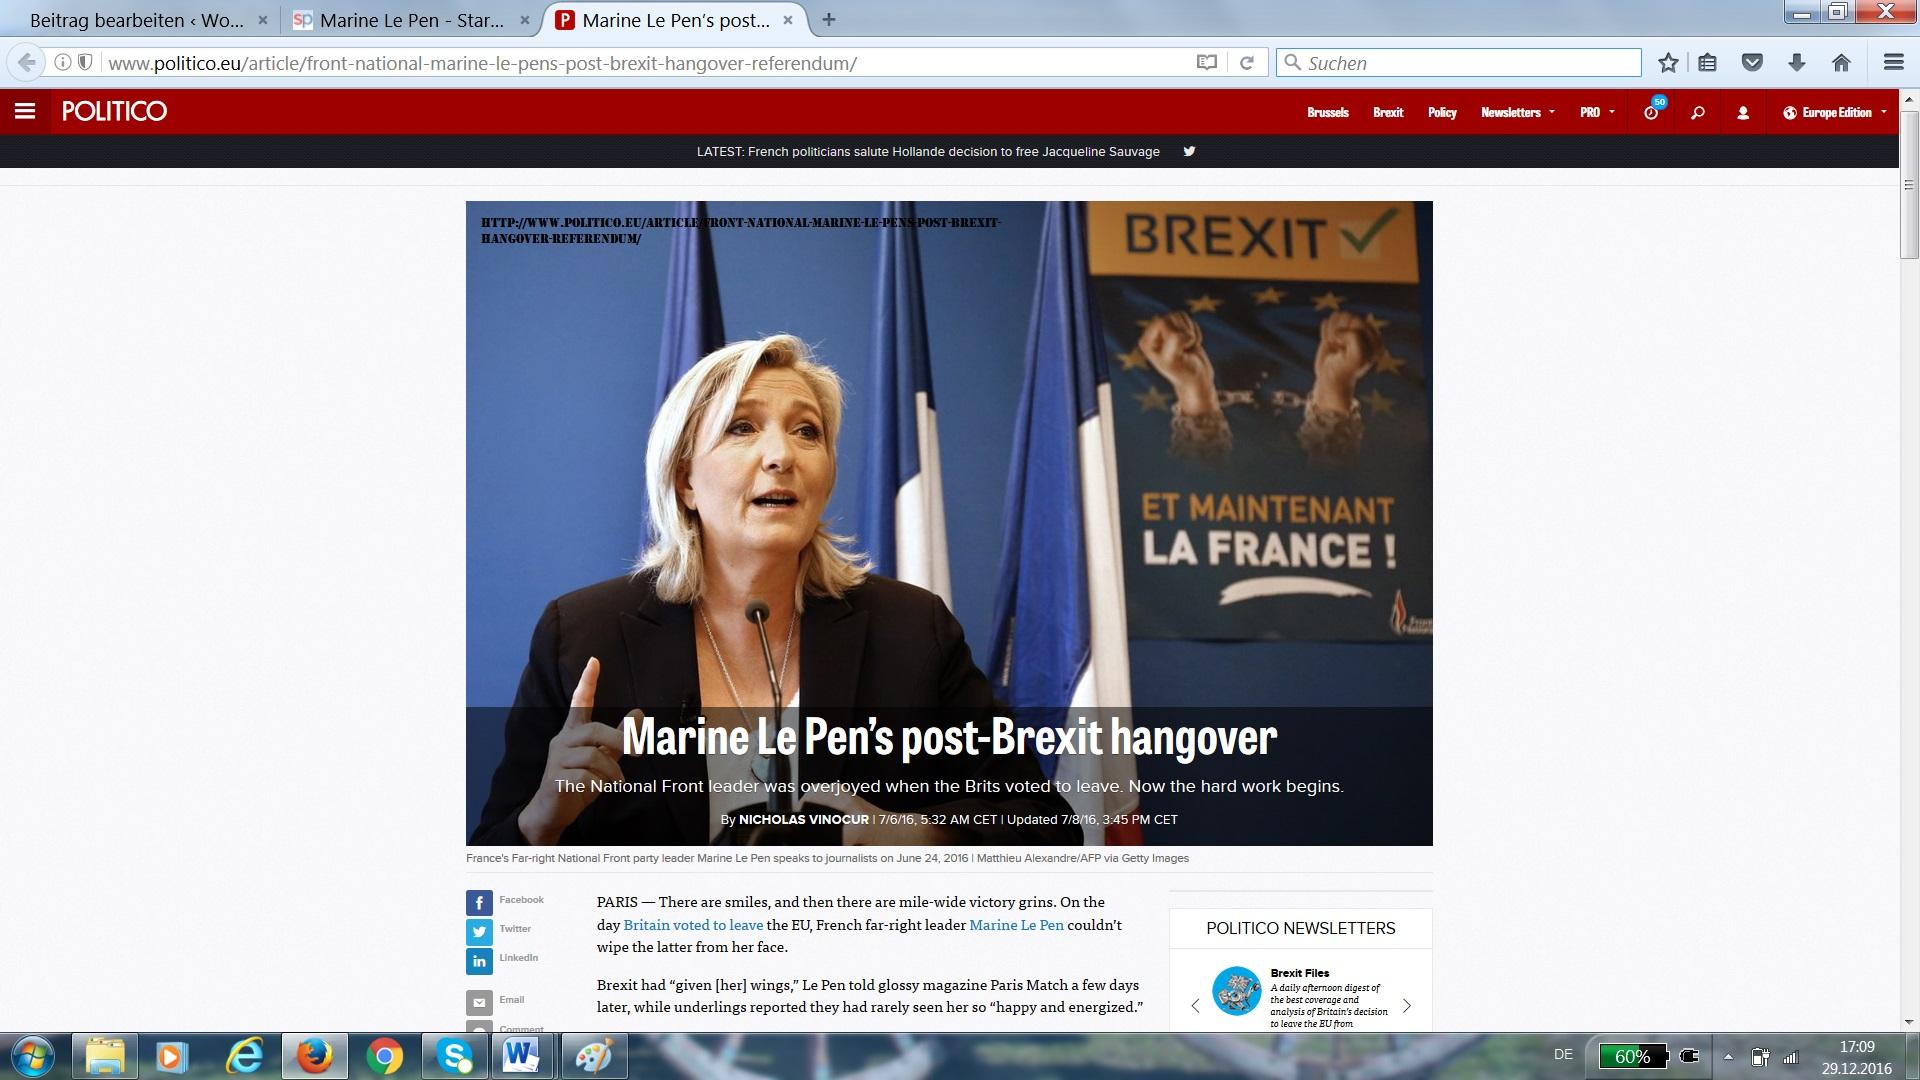 http://www.politico.eu/article/front-national-marine-le-pens-post-brexit-hangover-referendum/